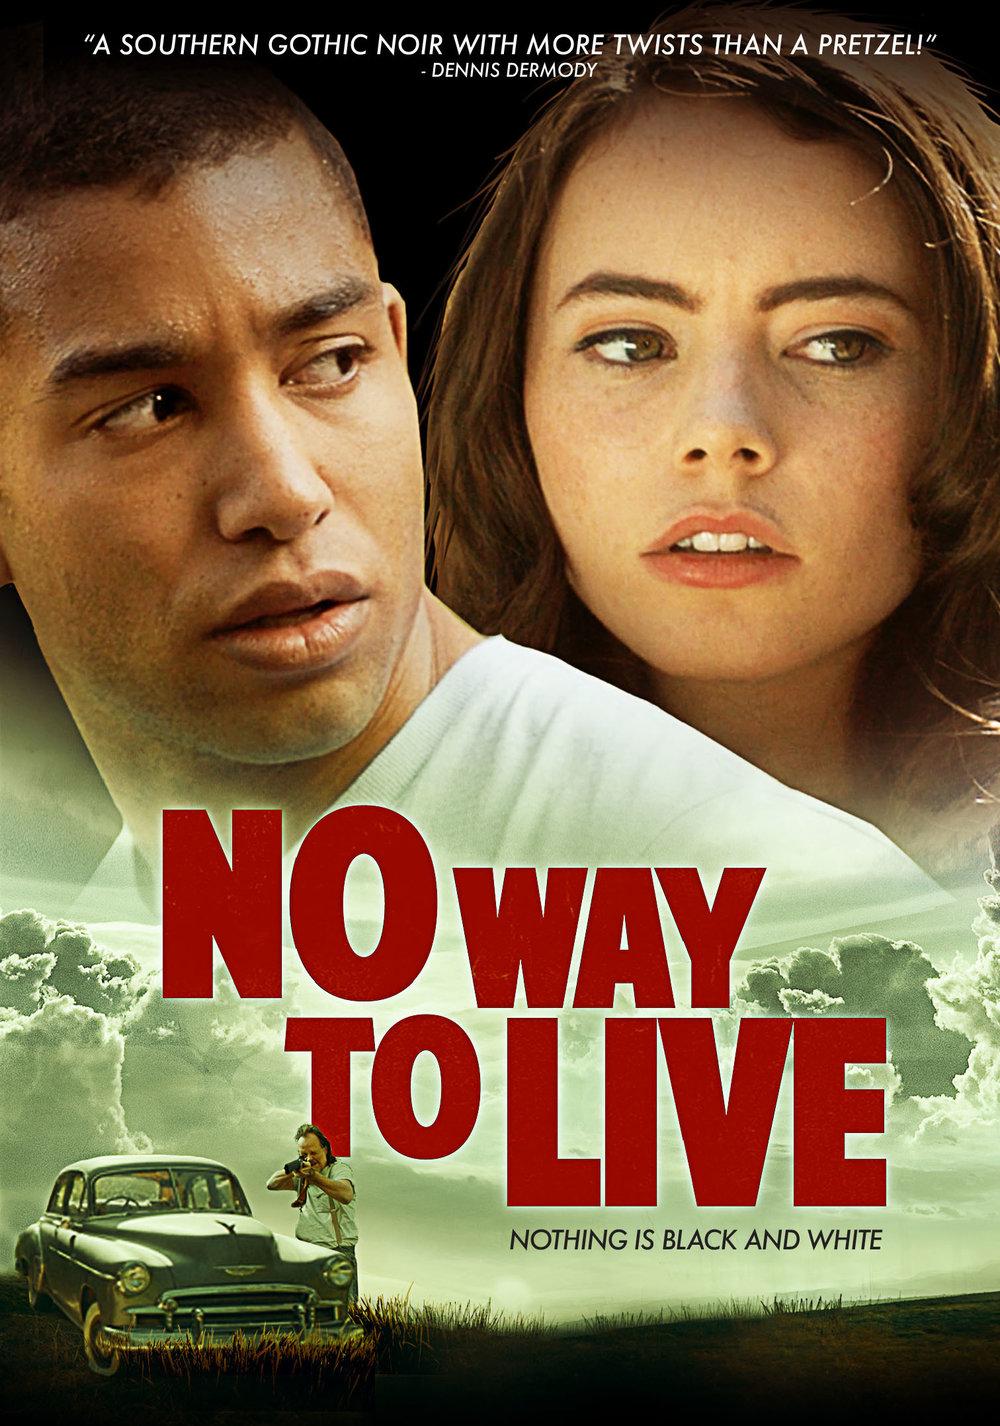 No Way to Live DVD 2D.jpg